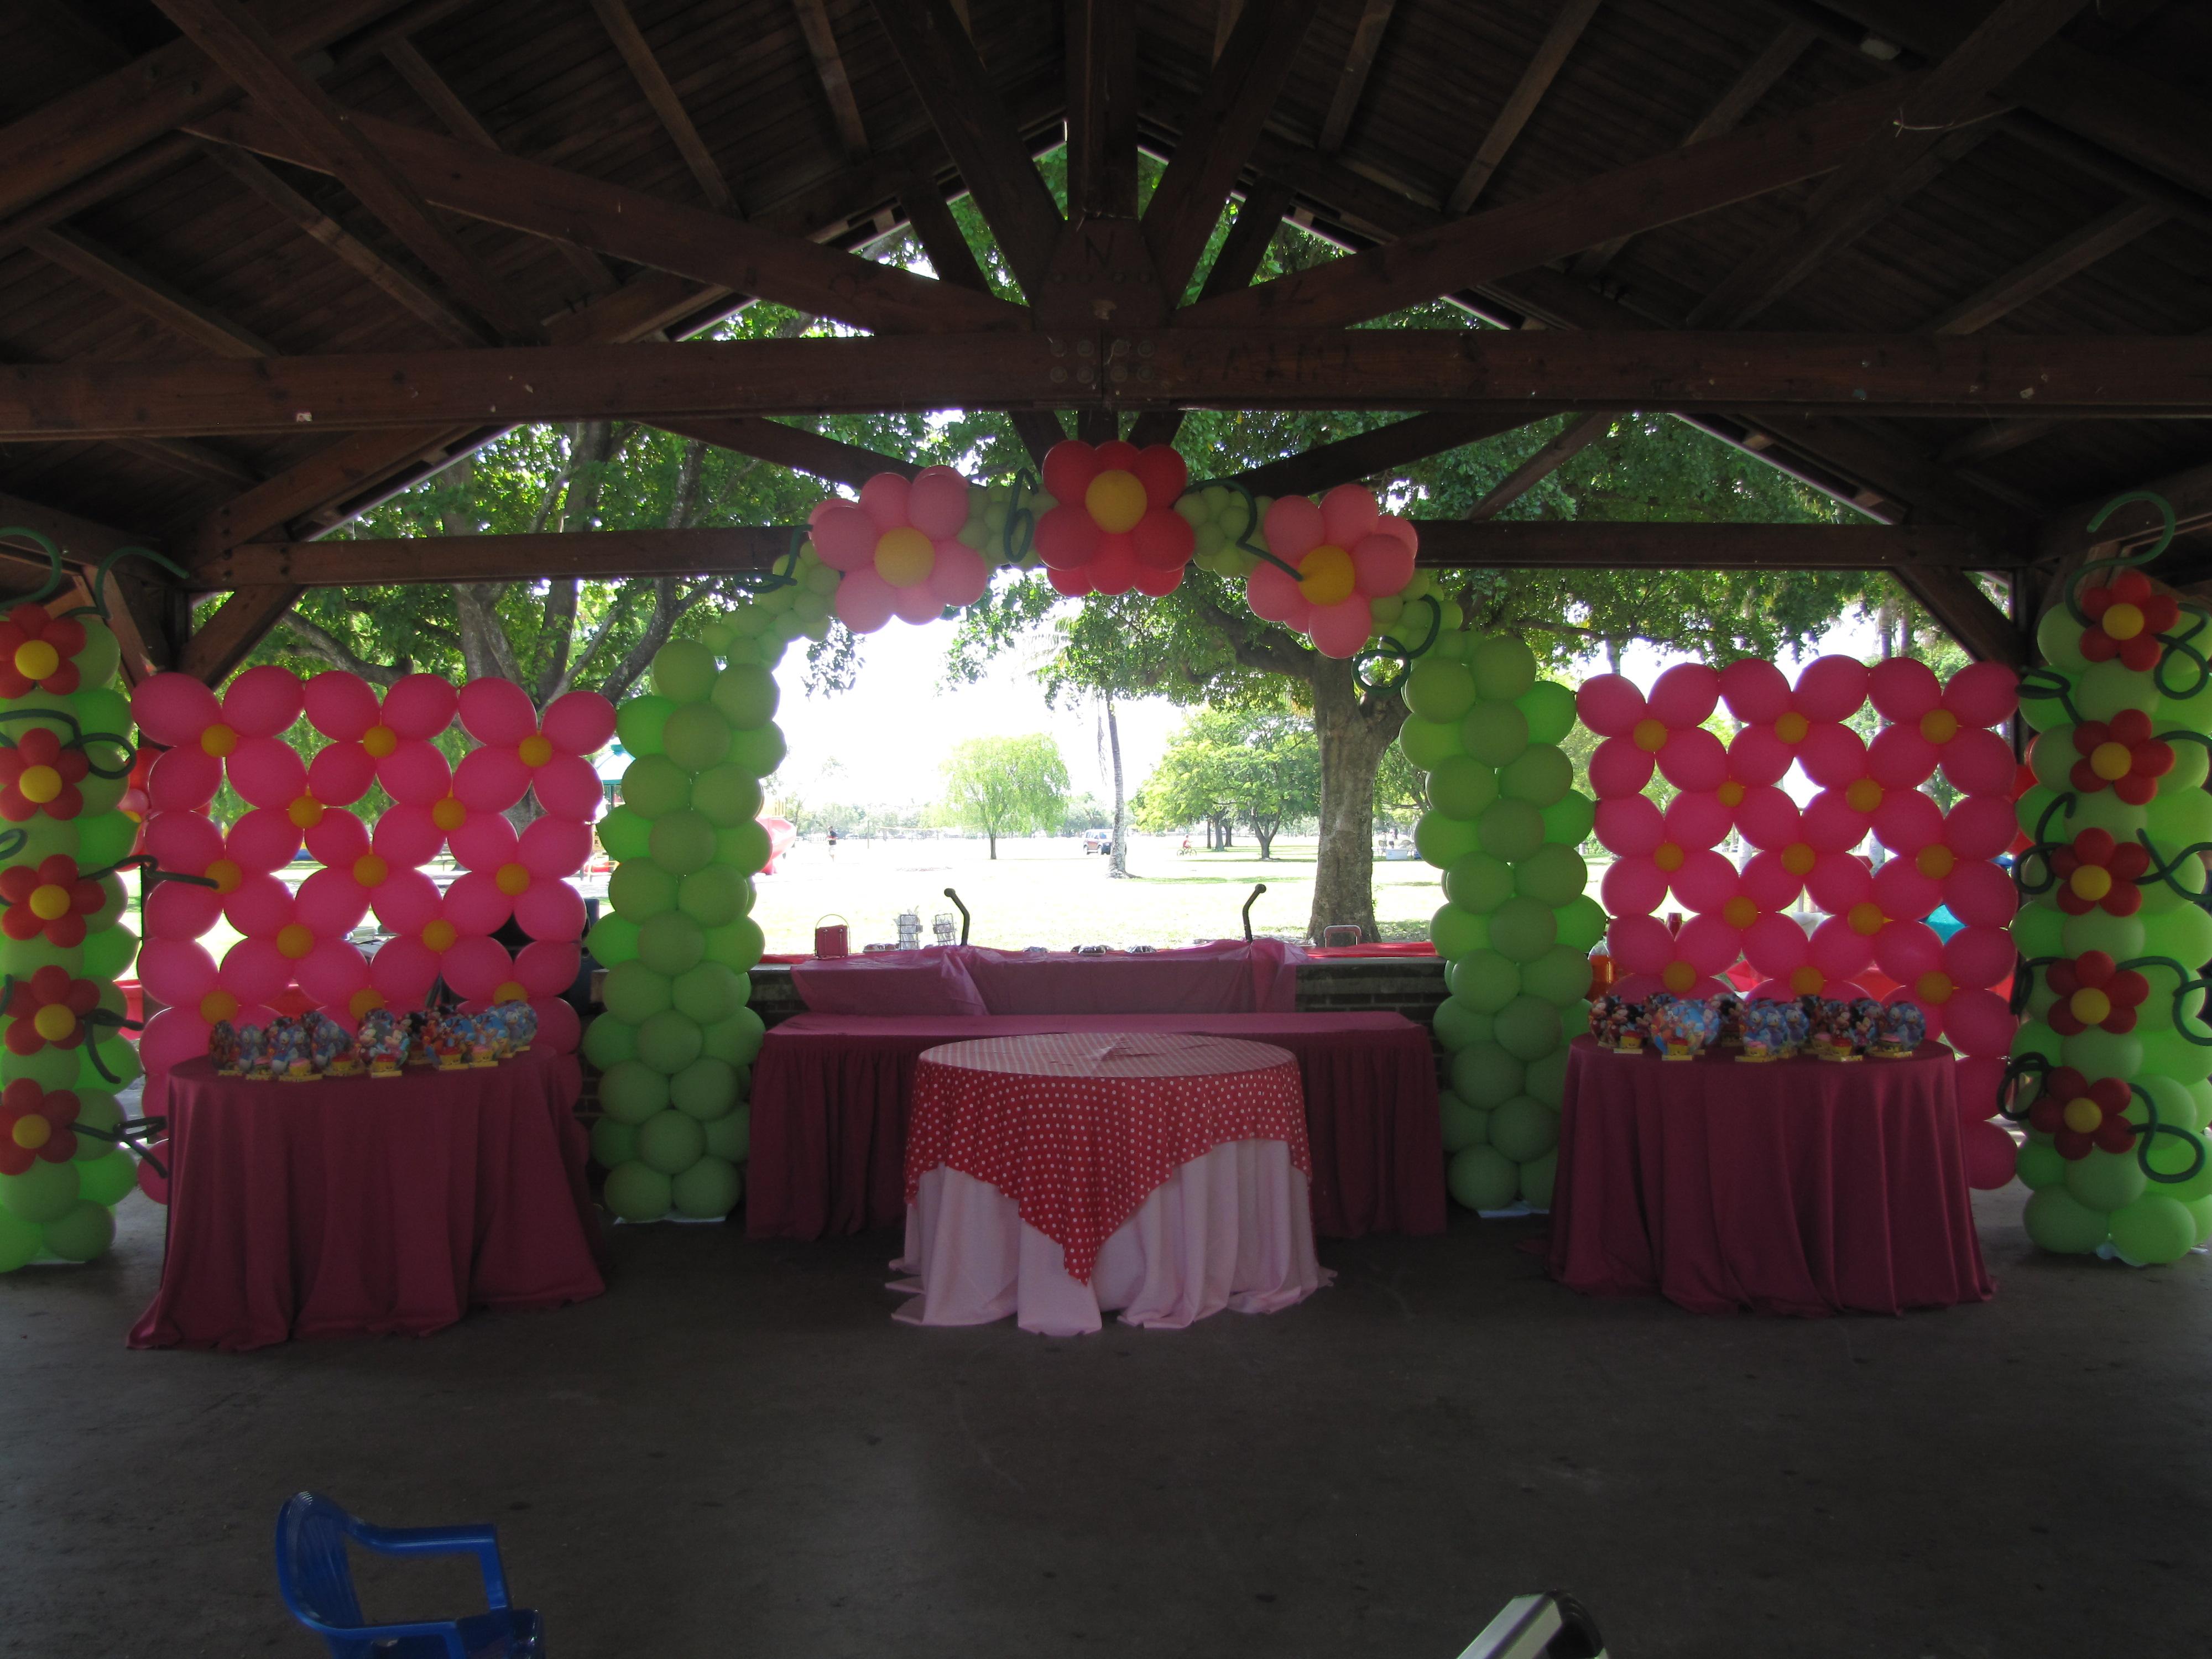 Regency Party Rental Supplies West Palm Beach Fl